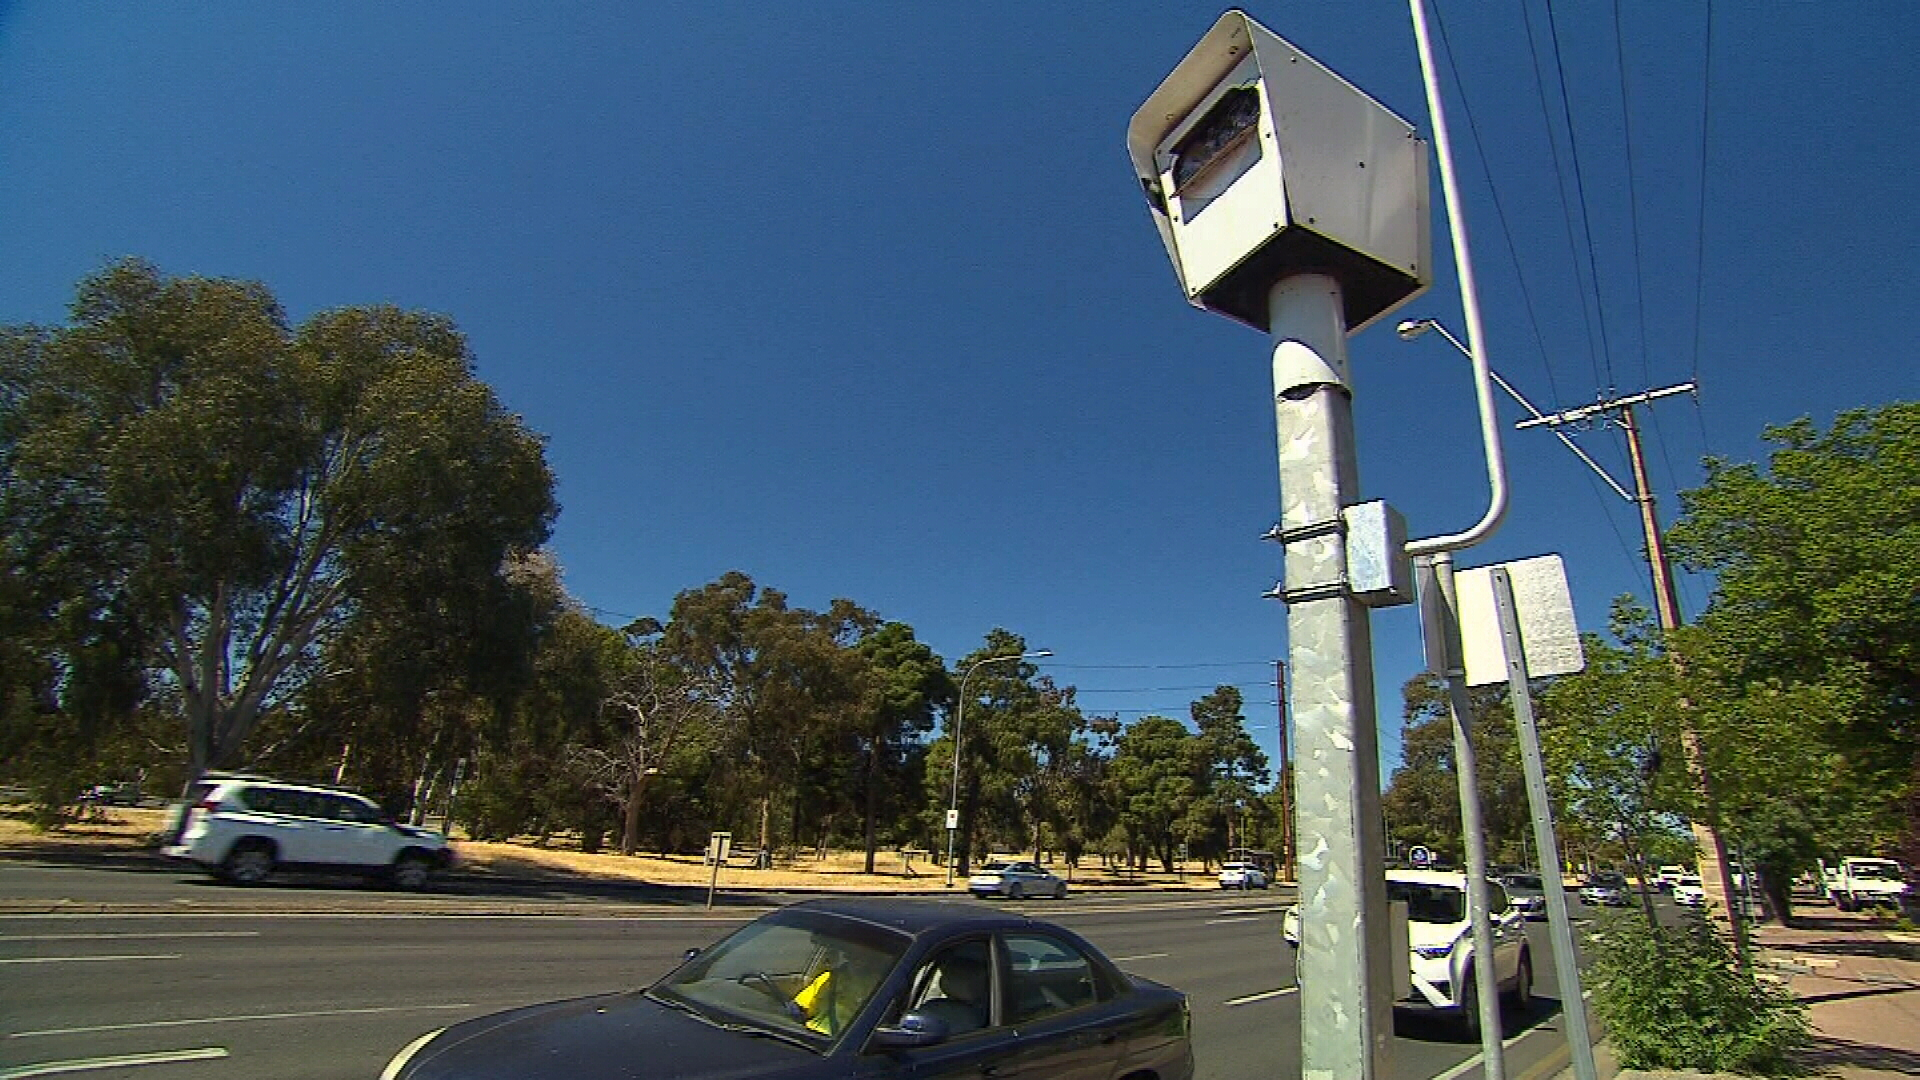 Man arrested over speed camera fires